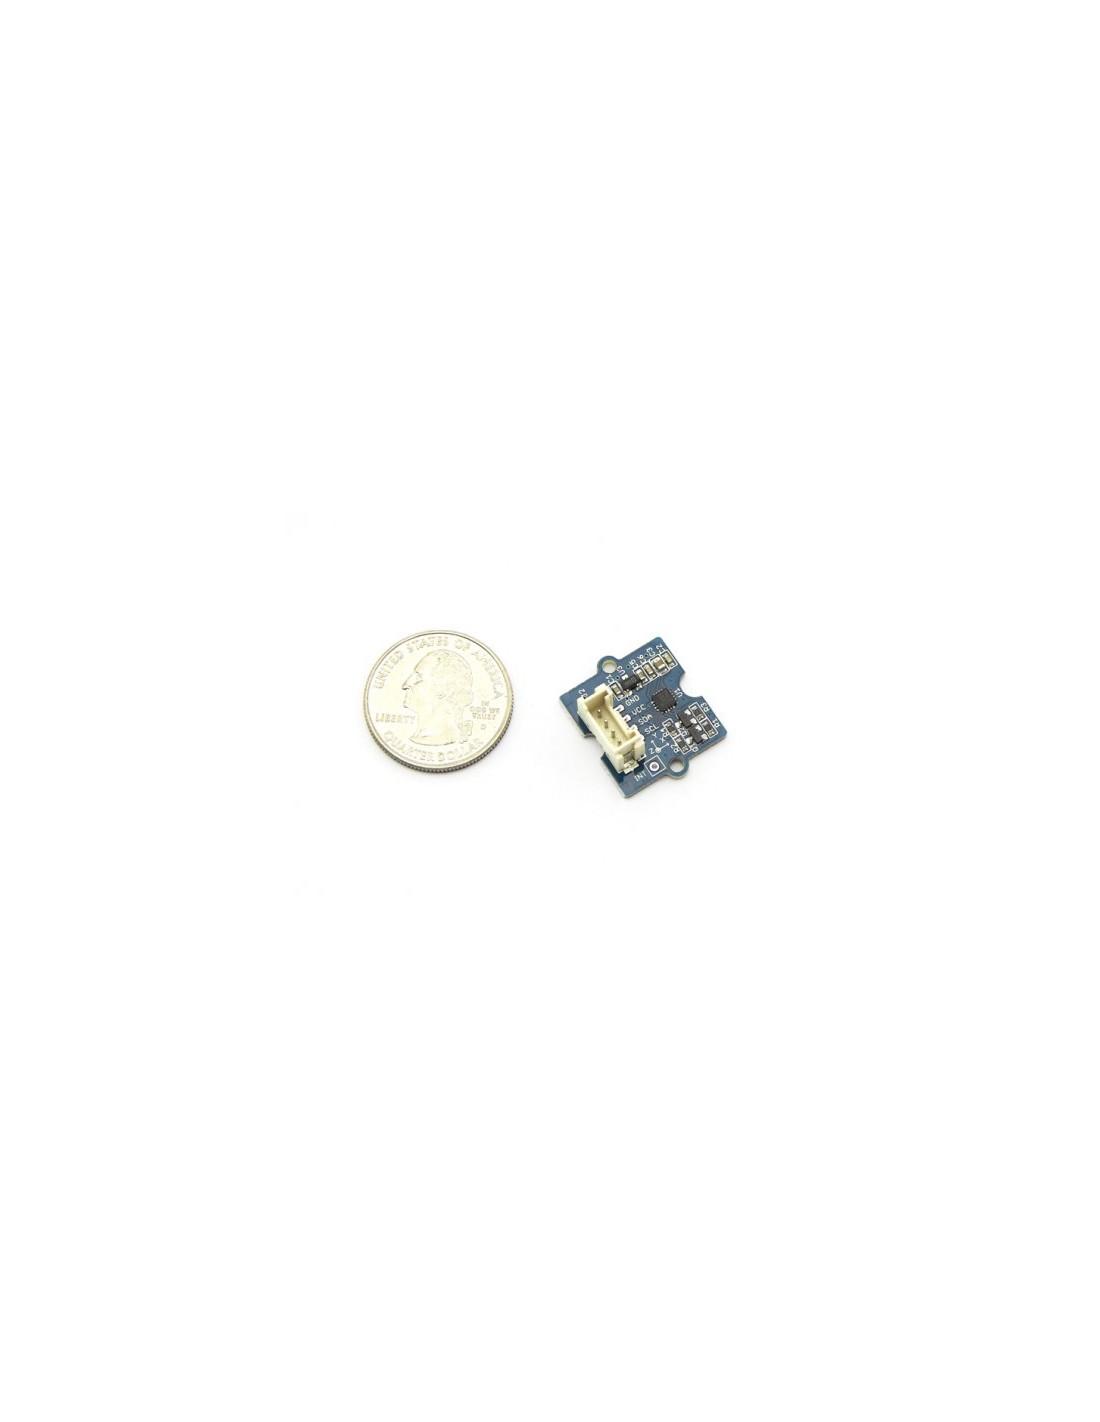 Grove 3 Axis Digital Compass Circuit